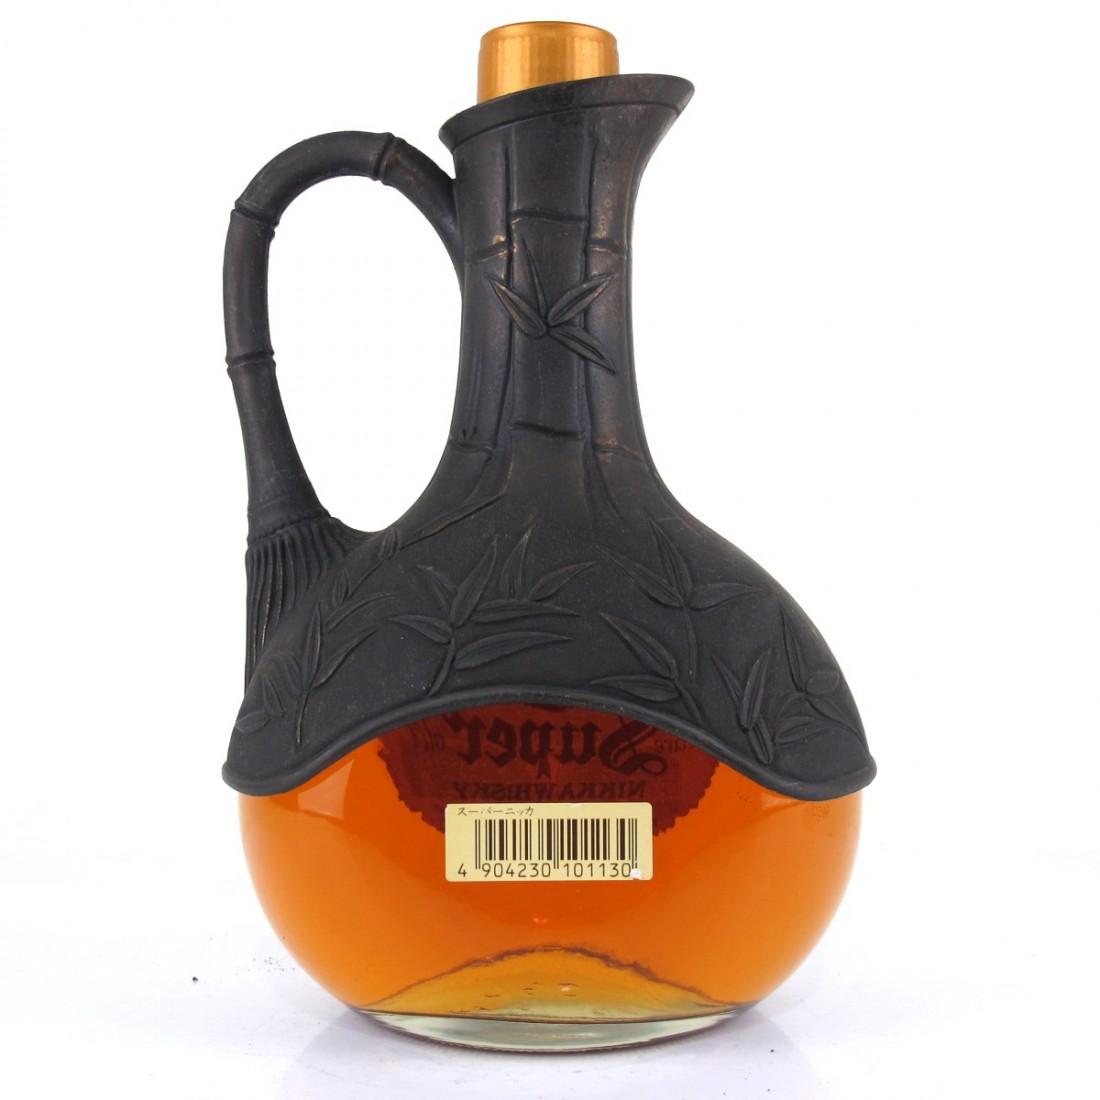 Nikka Super Whisky Amphora